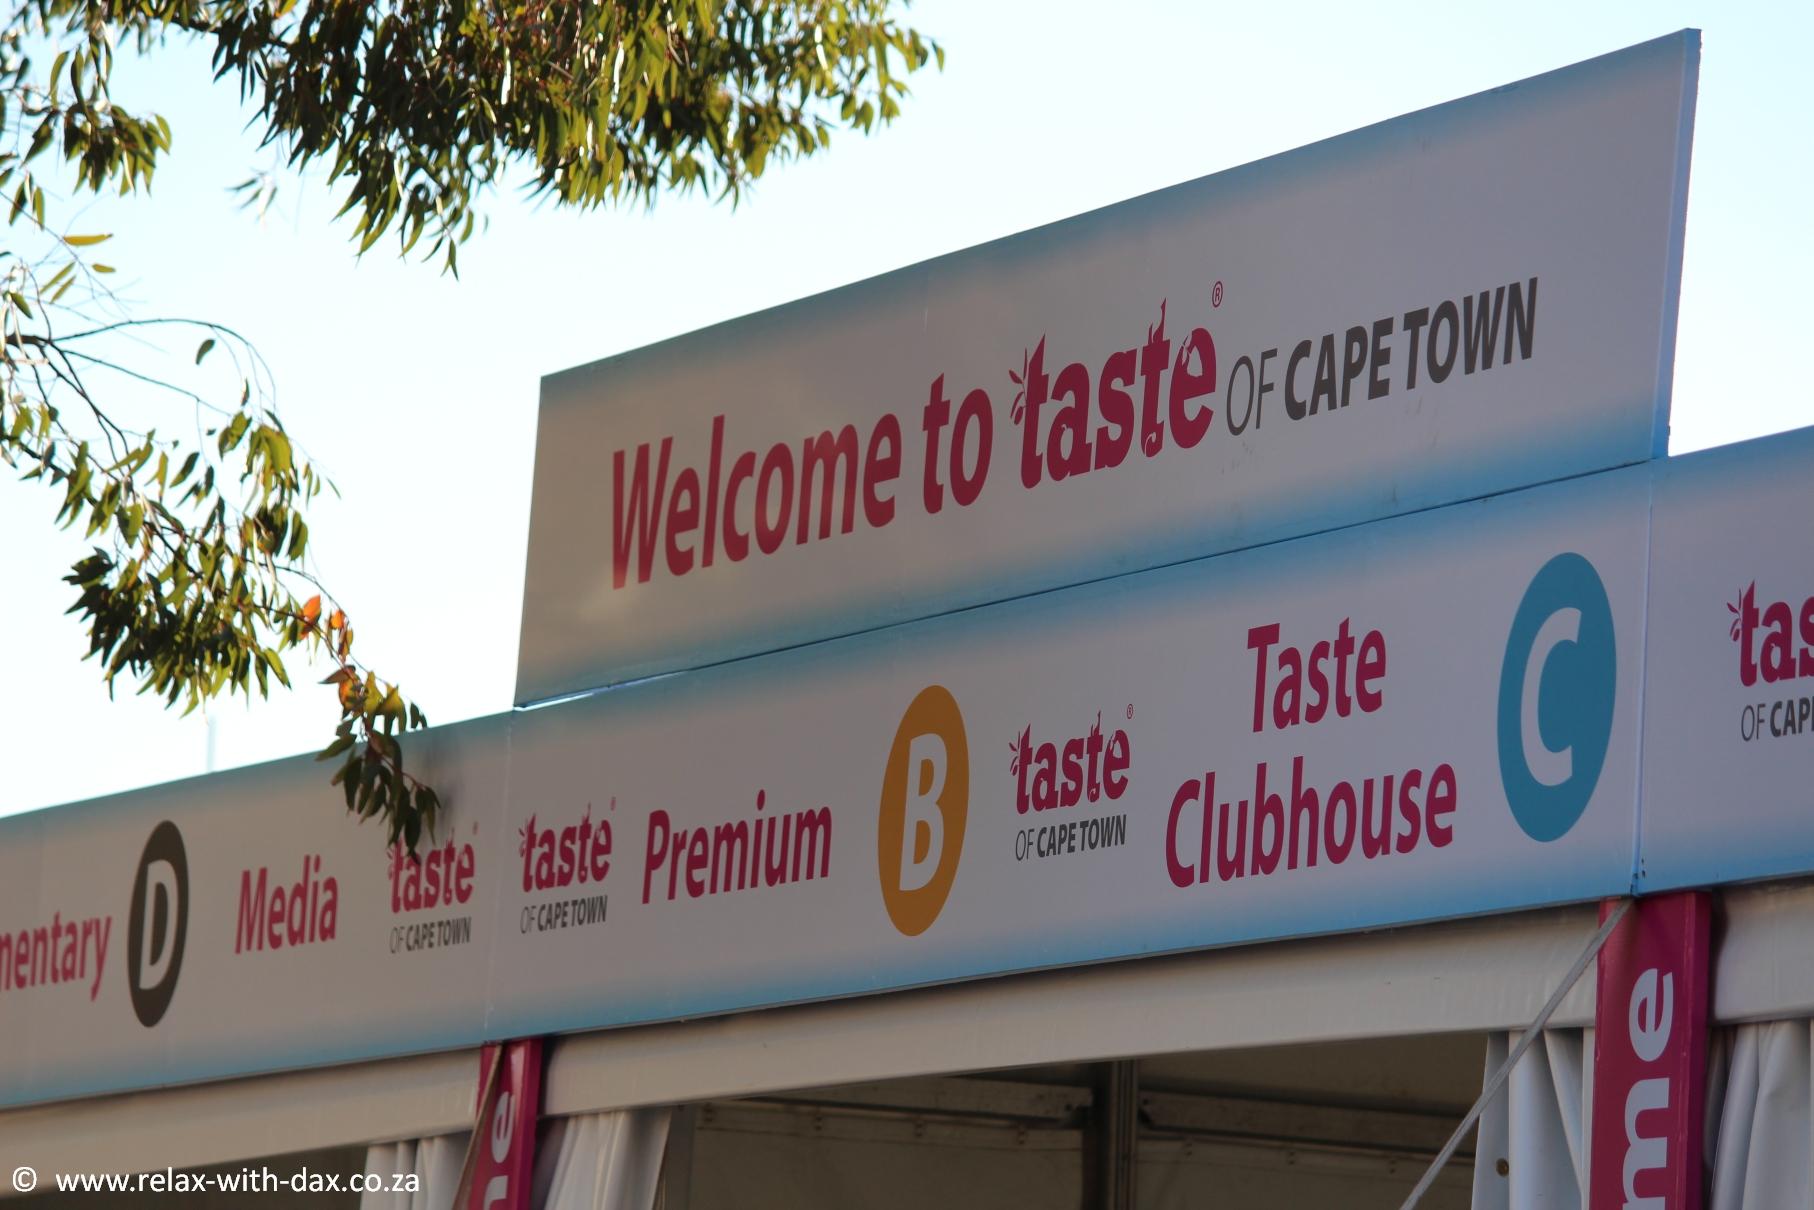 Taste of Cape Town